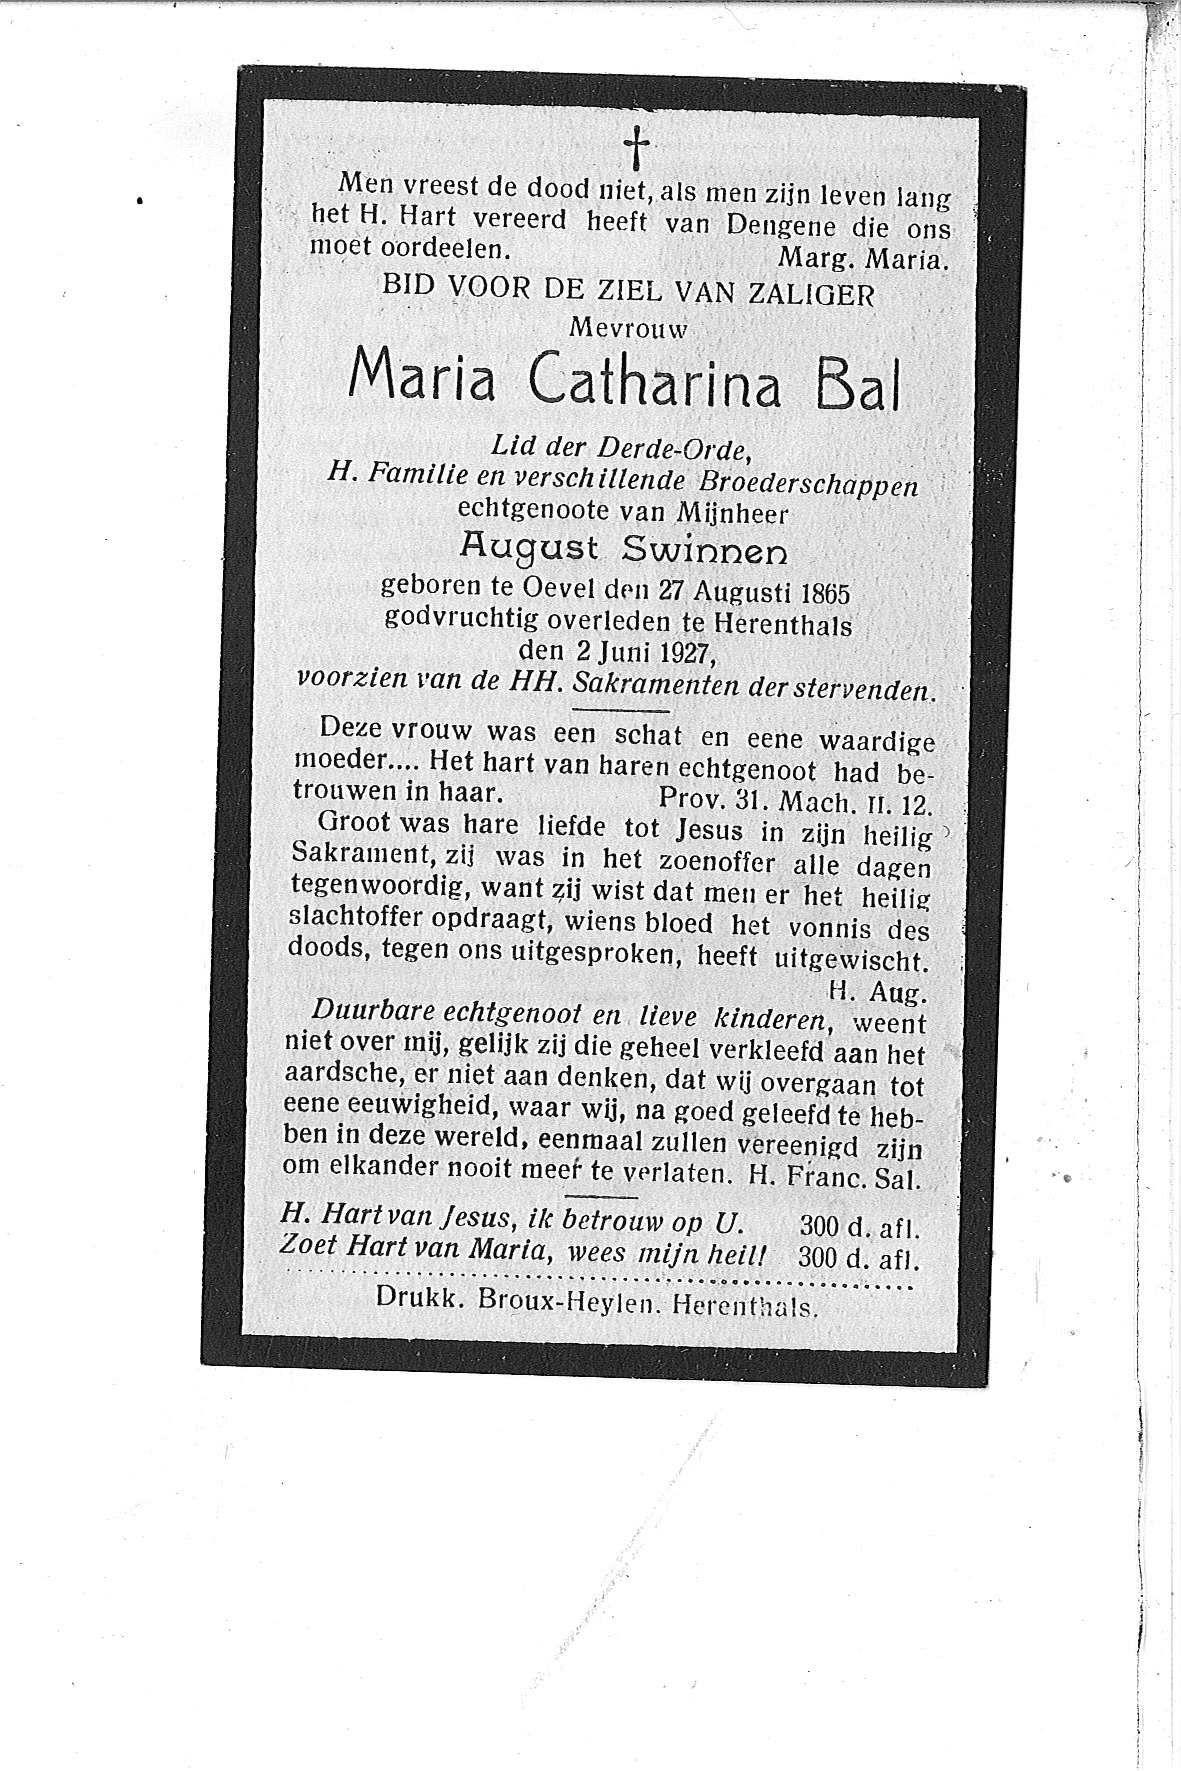 Maria-Catharina(1927)20101006151440_00003.jpg